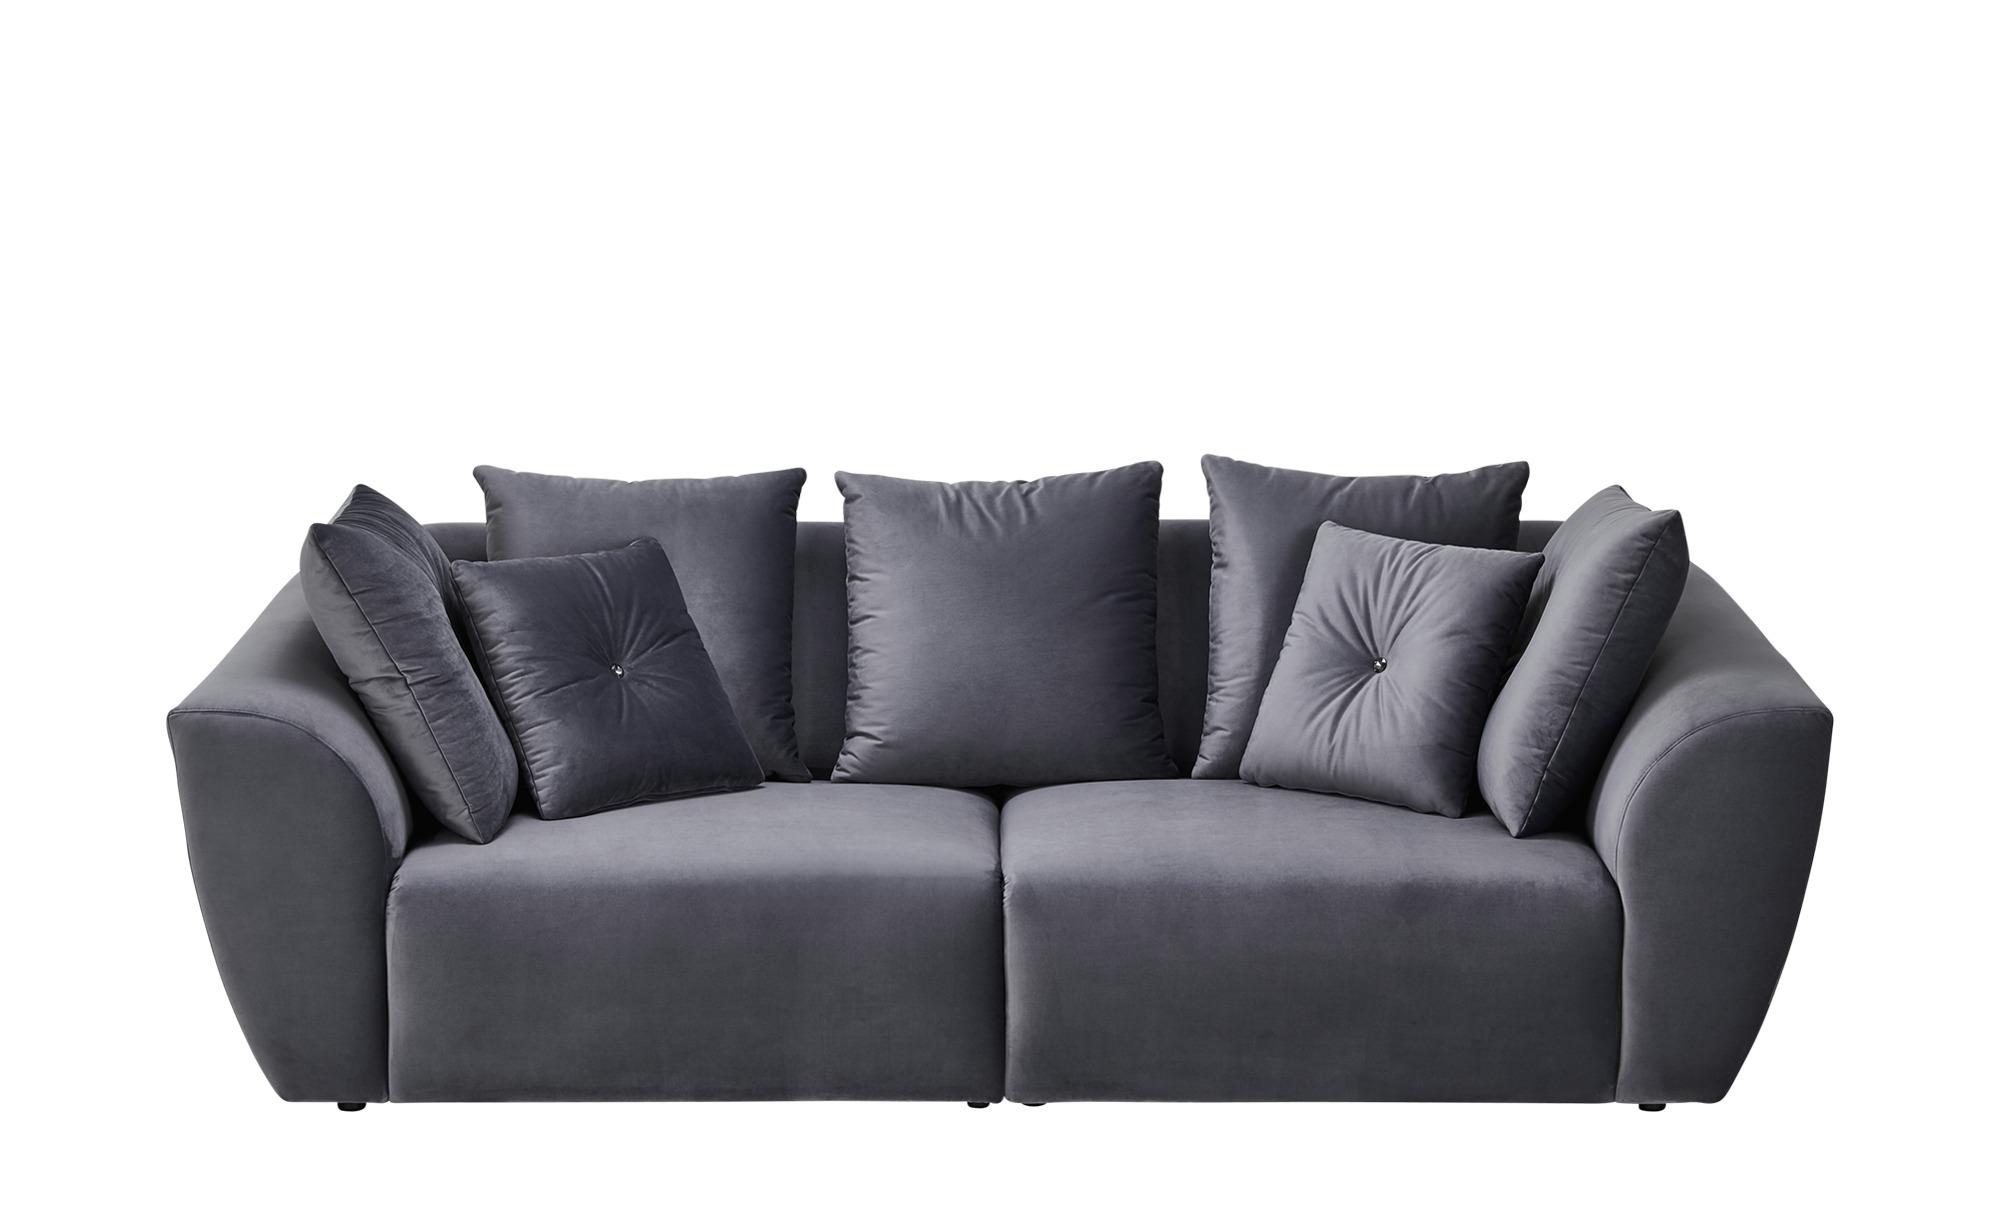 smart Big Sofa  Krista ¦ grau ¦ Maße (cm): B: 254 H: 92 T: 113 Polstermöbel > Sofas > Big-Sofas - Höffner